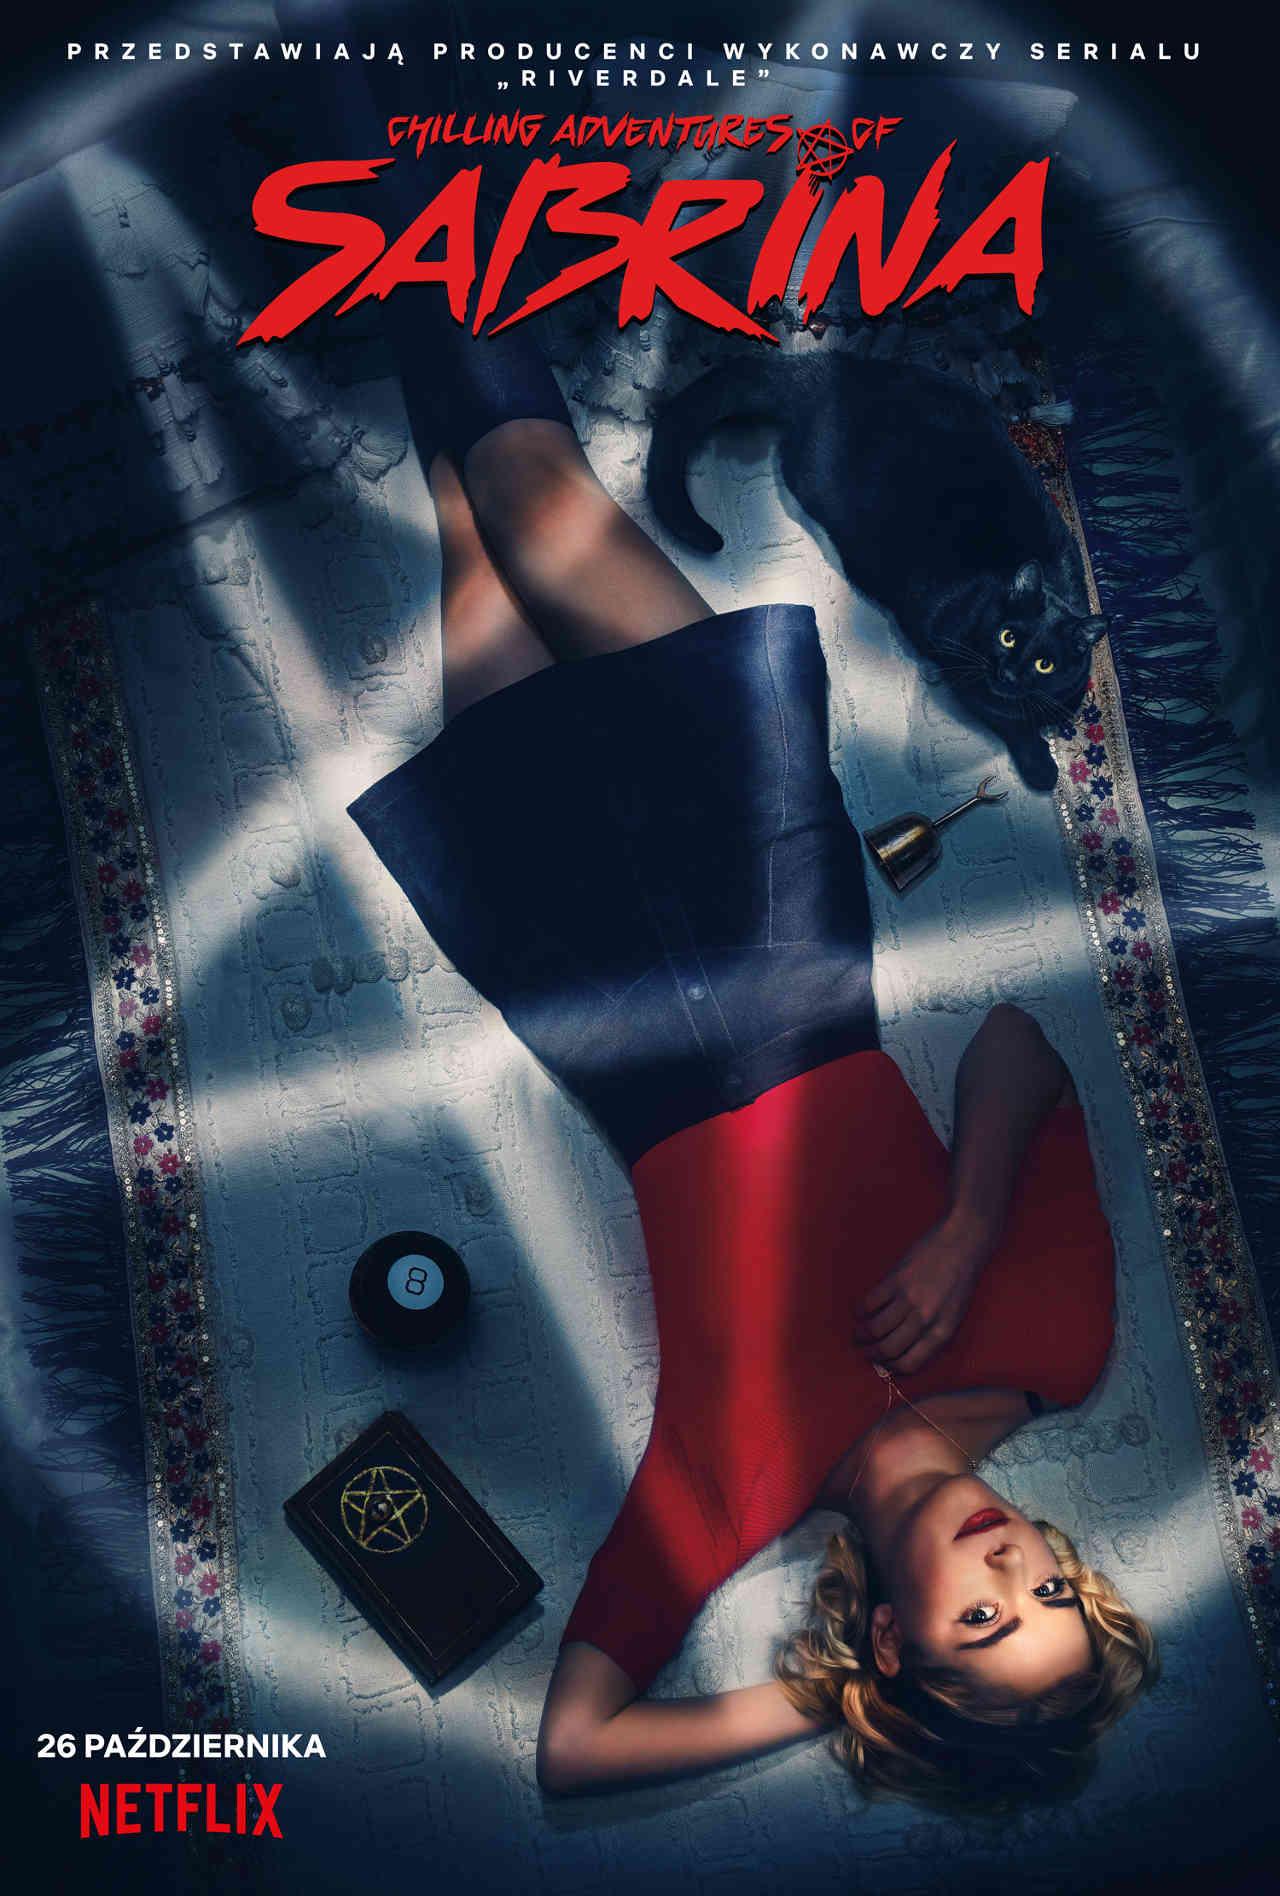 netflix-chilling-adventures-of-sabrina-poster-pl